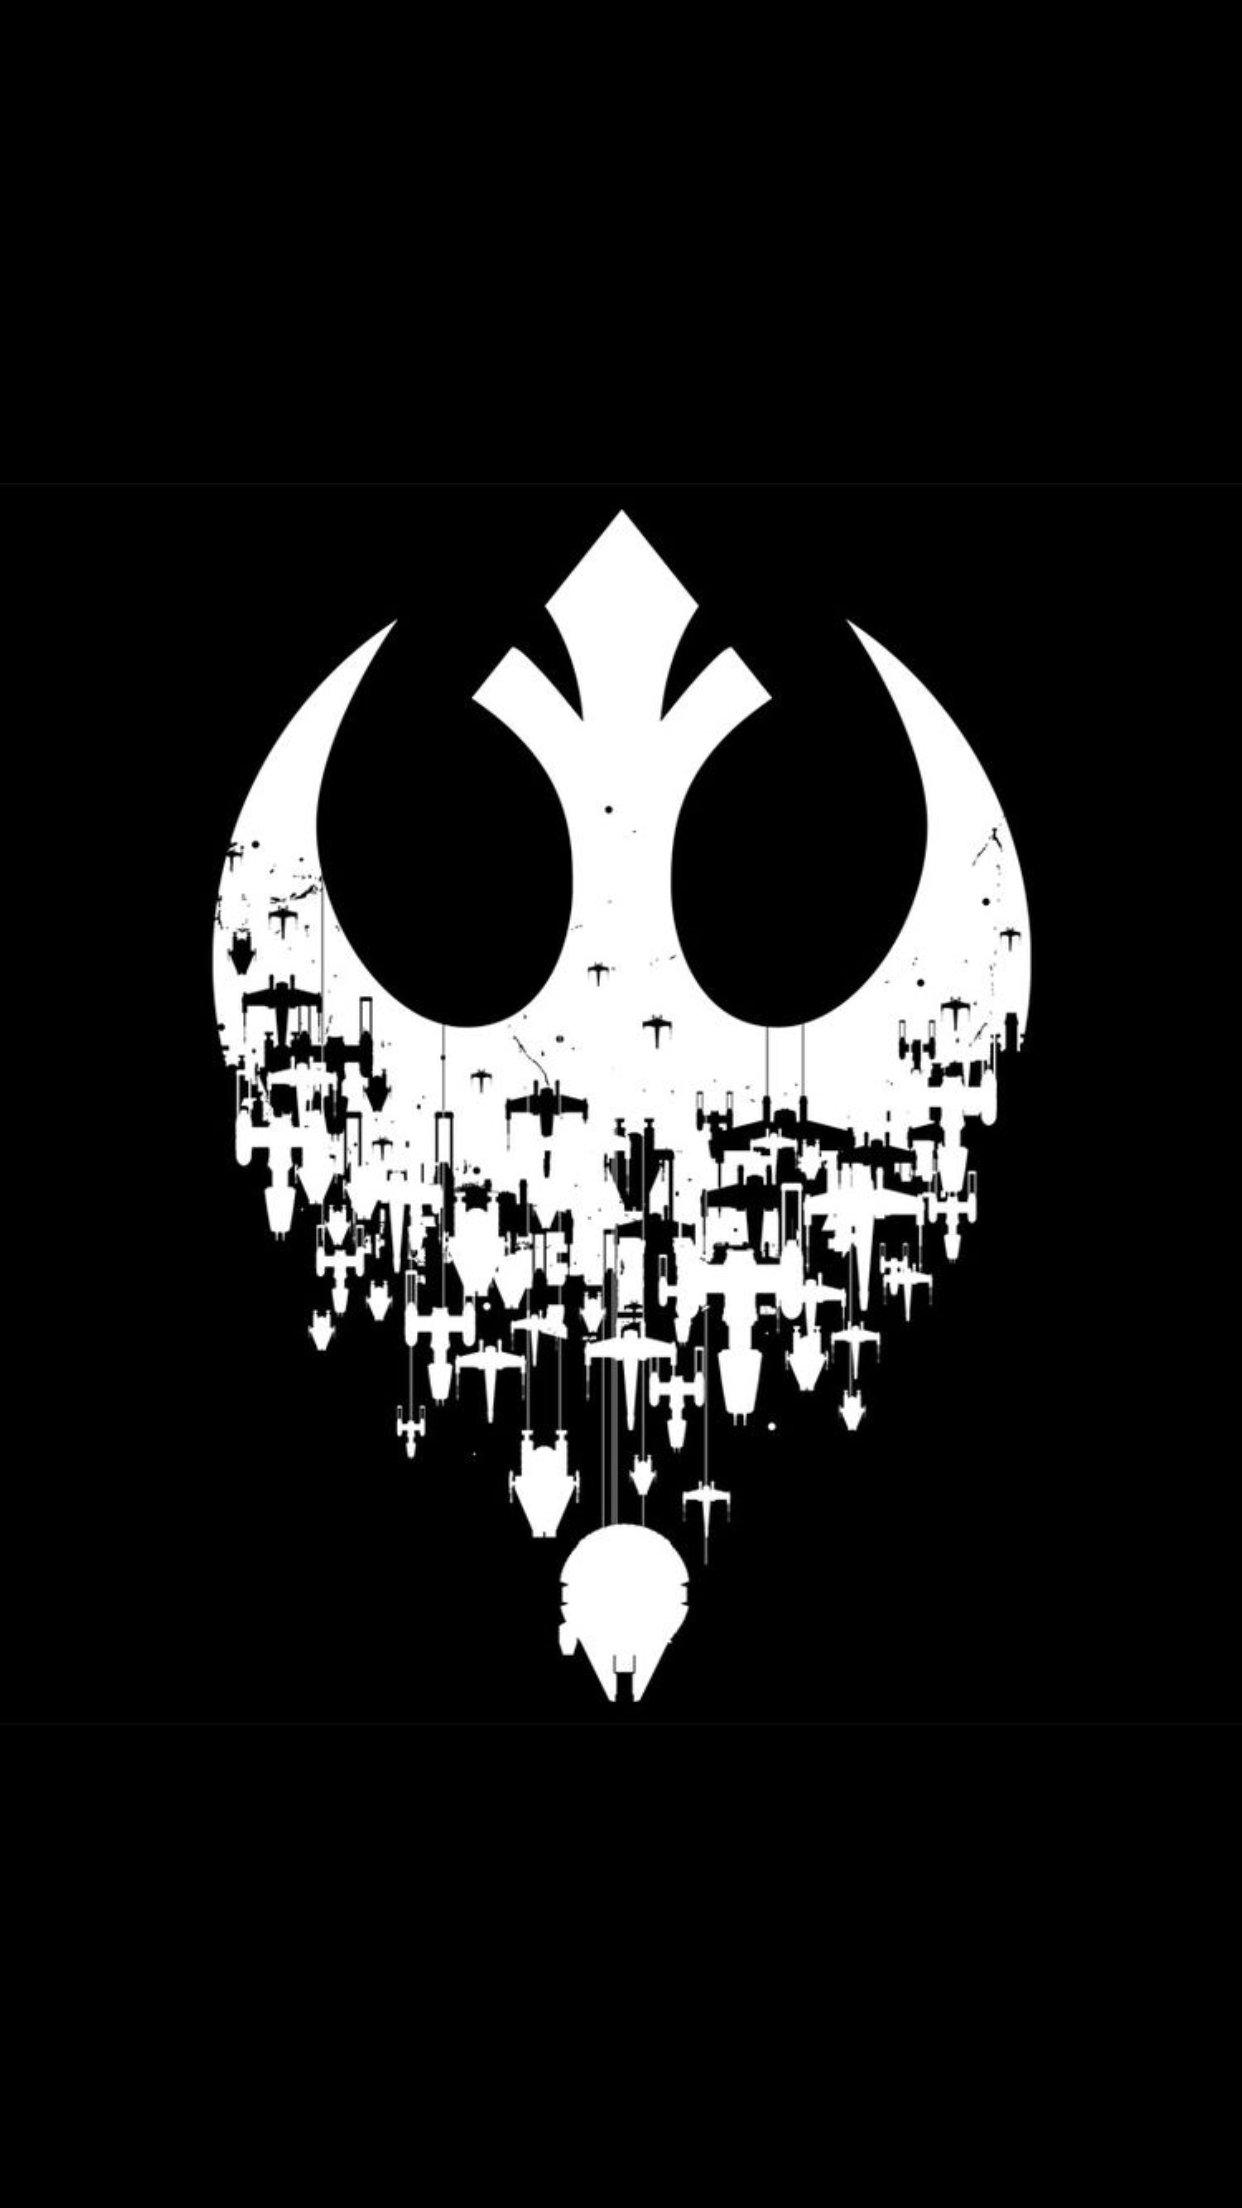 Star Wars Decal Rebel Alliance Skull Insignia Solid Design ... |Cool Rebellion Symbol